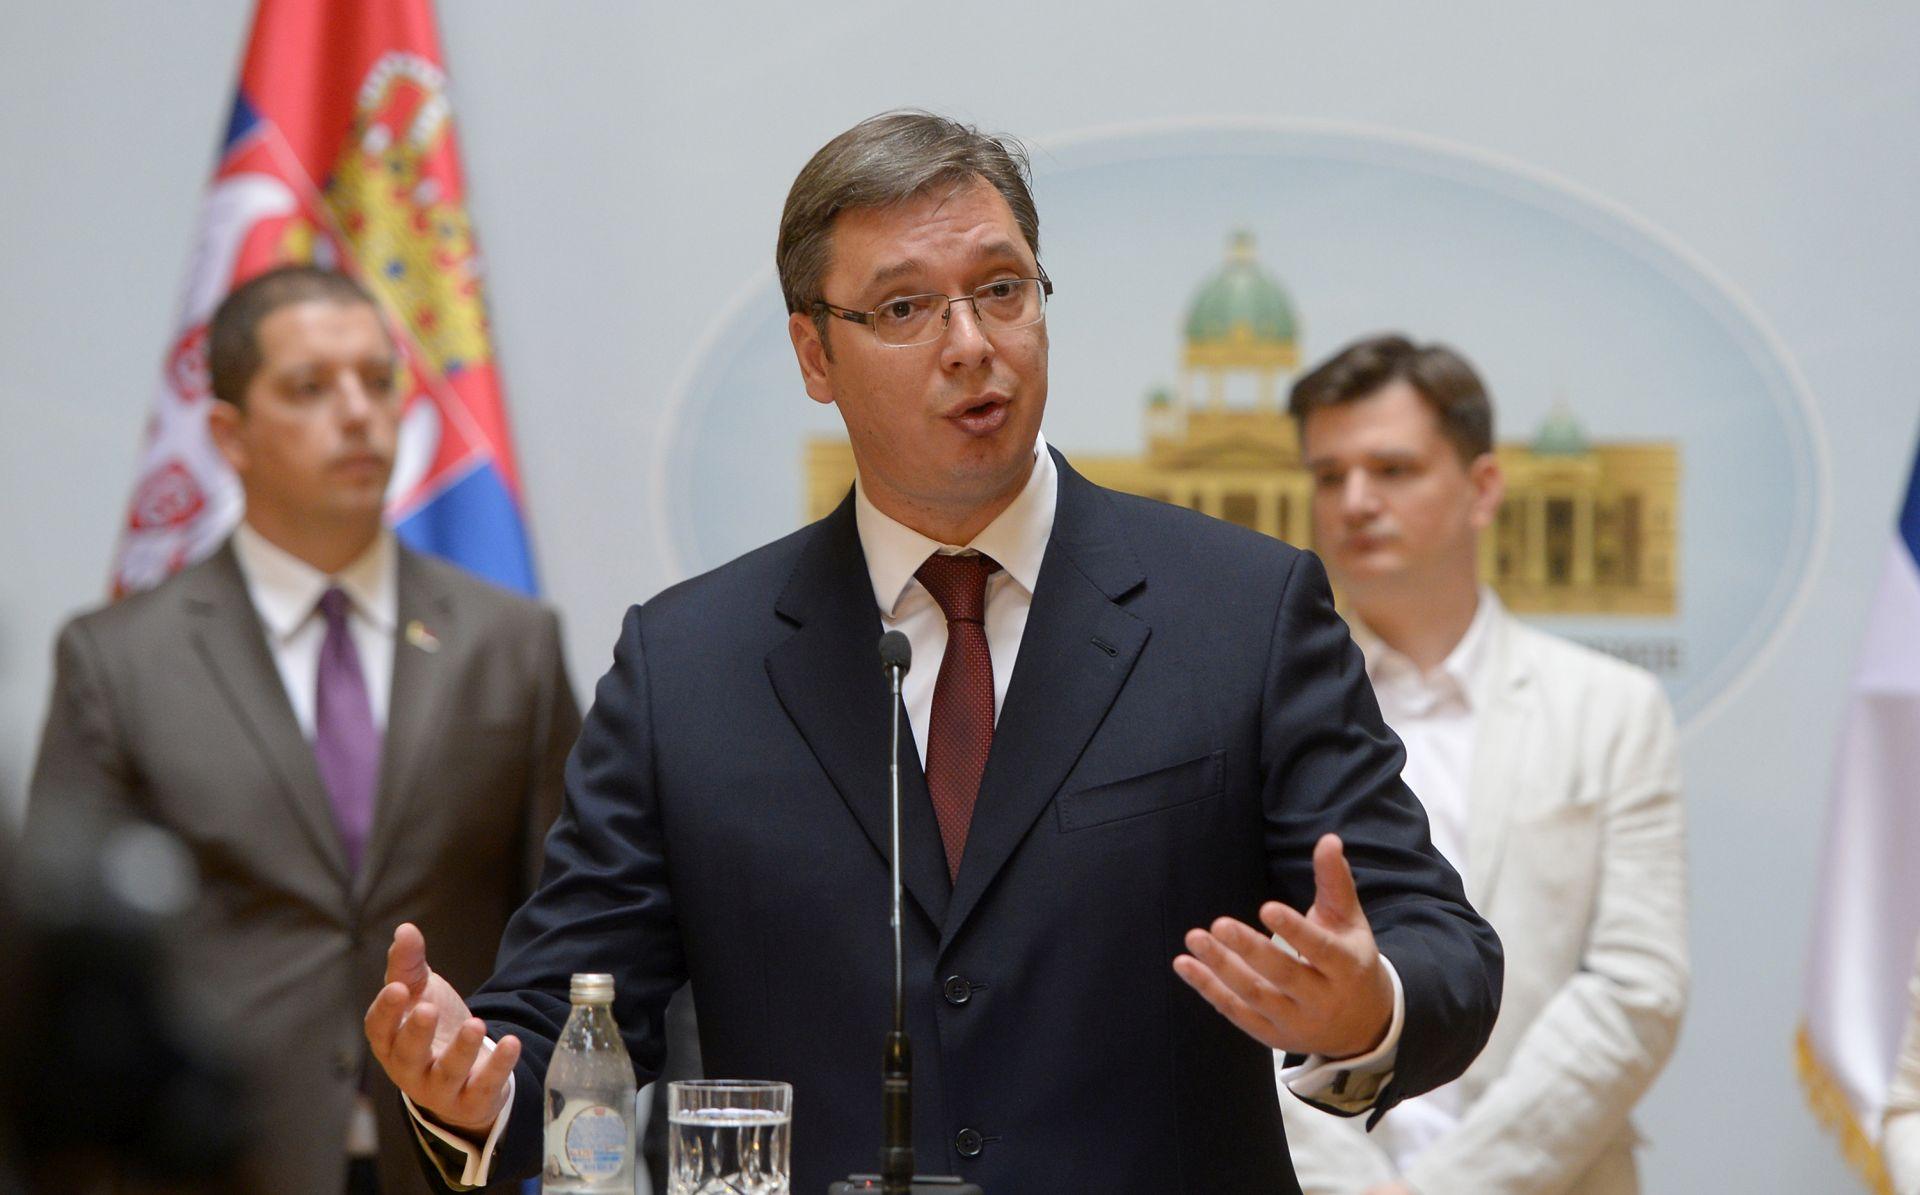 PREDSTAVLJENE REFORME: Vučićev govor od pet i pol sati oporba usporedila s onima sovjetskog tipa